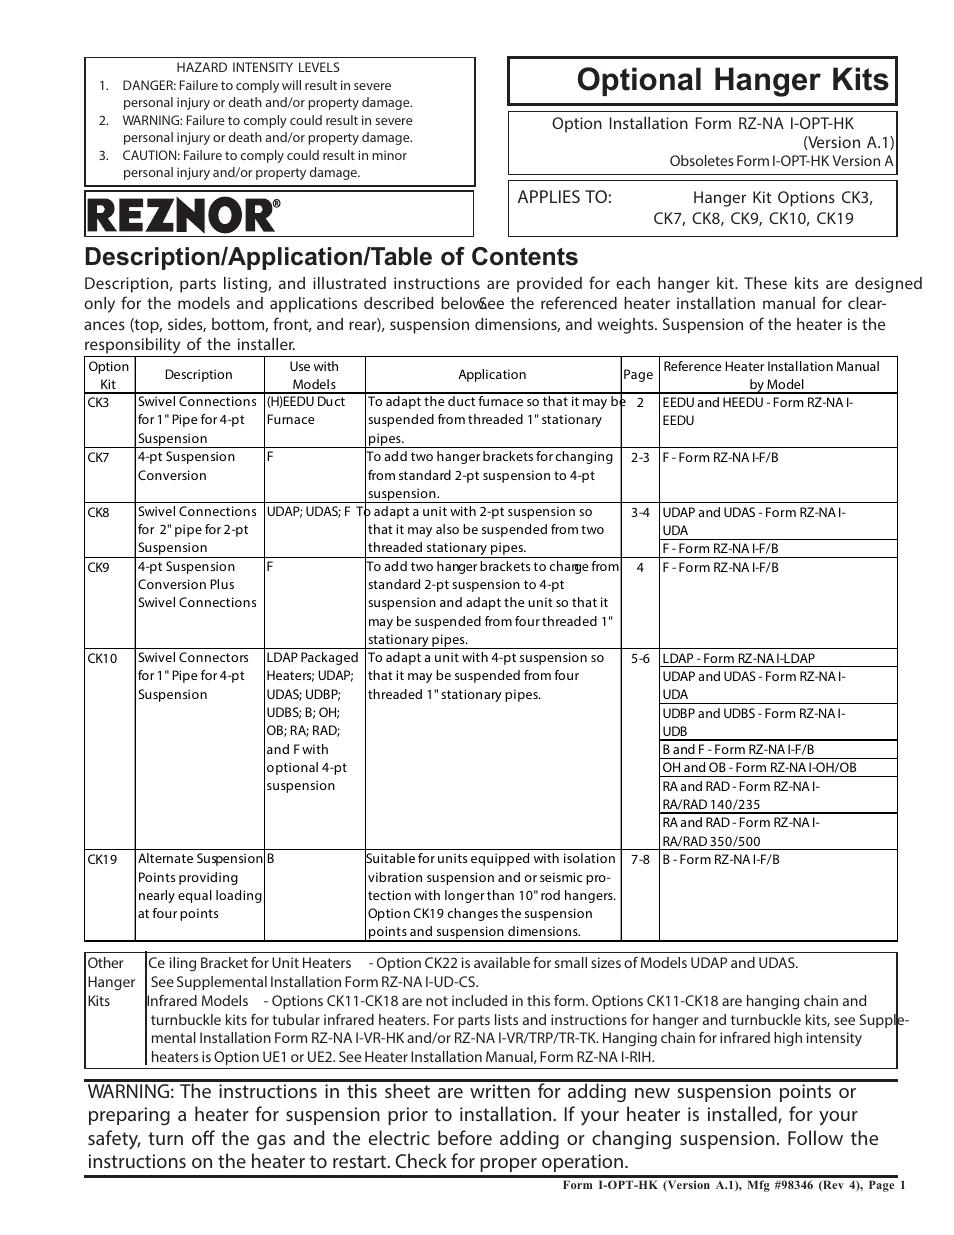 Reznor Ck10 Option - Installation